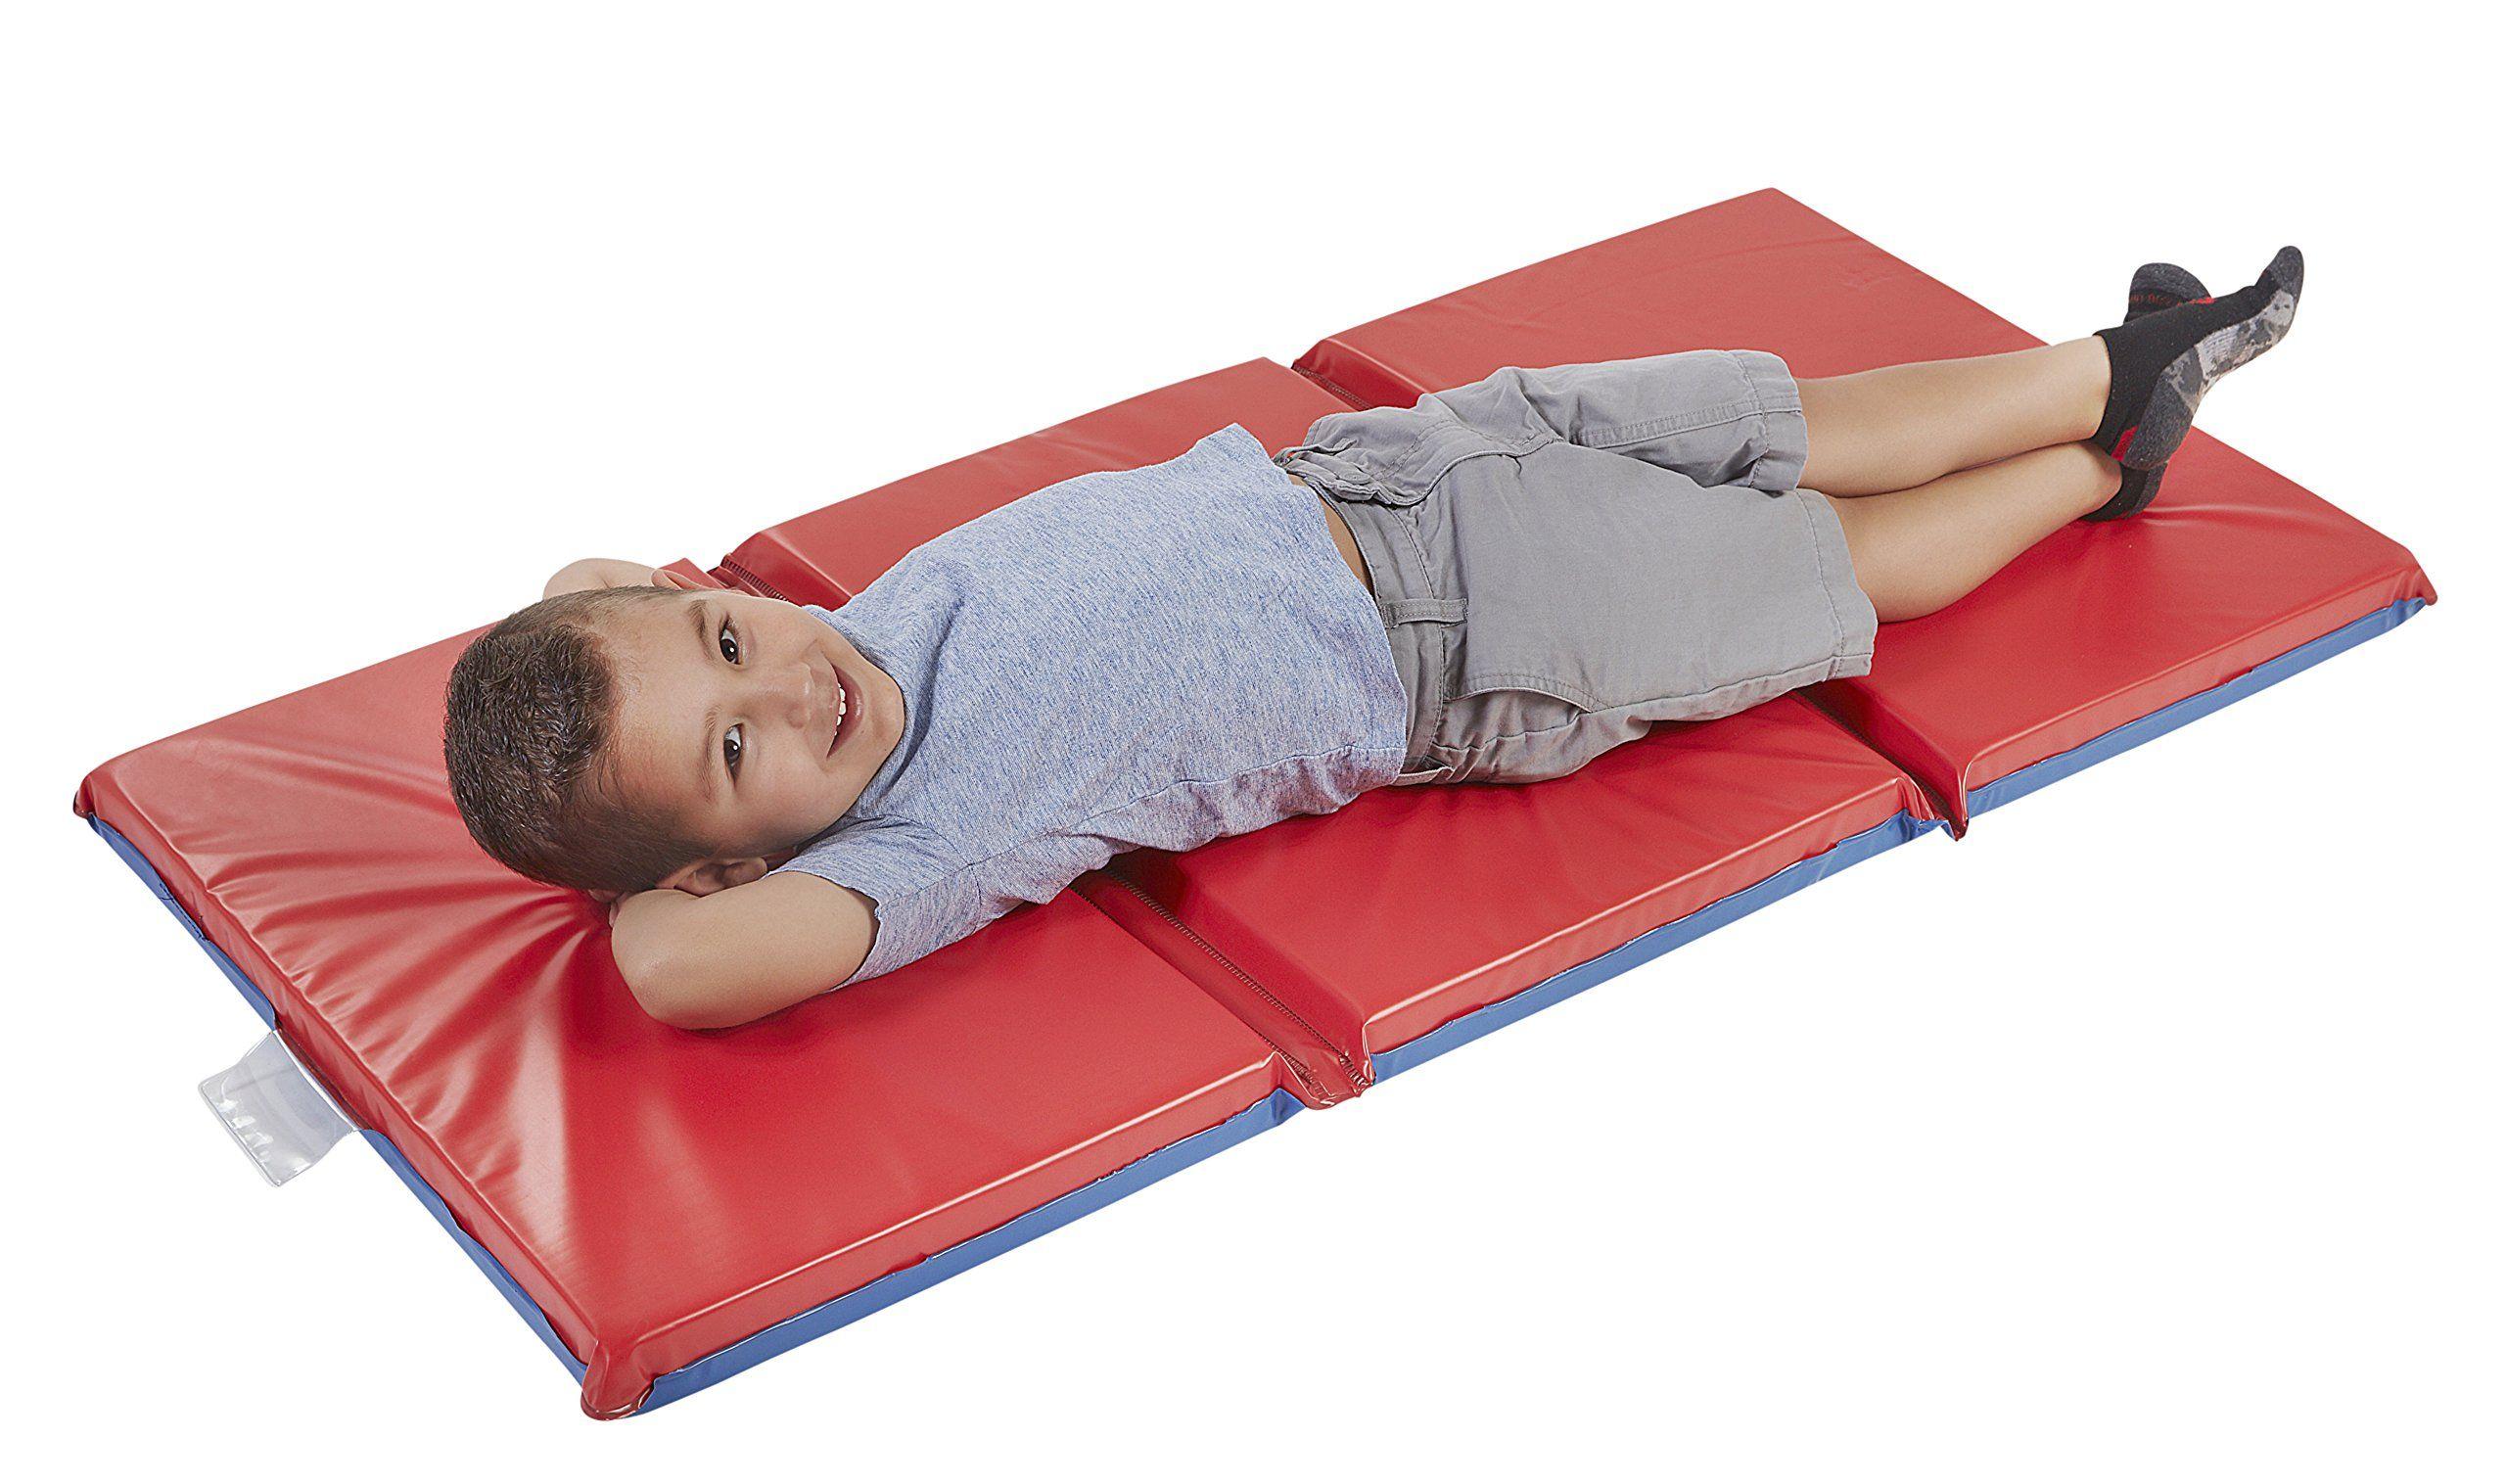 Ecr4kids Premium 3 Fold Daycare Rest Mat Blue And Red 2 Thick Ad Fold Daycare Ecr4kids Premium Ecr4kids Toddler Nap Toddler Nap Mat